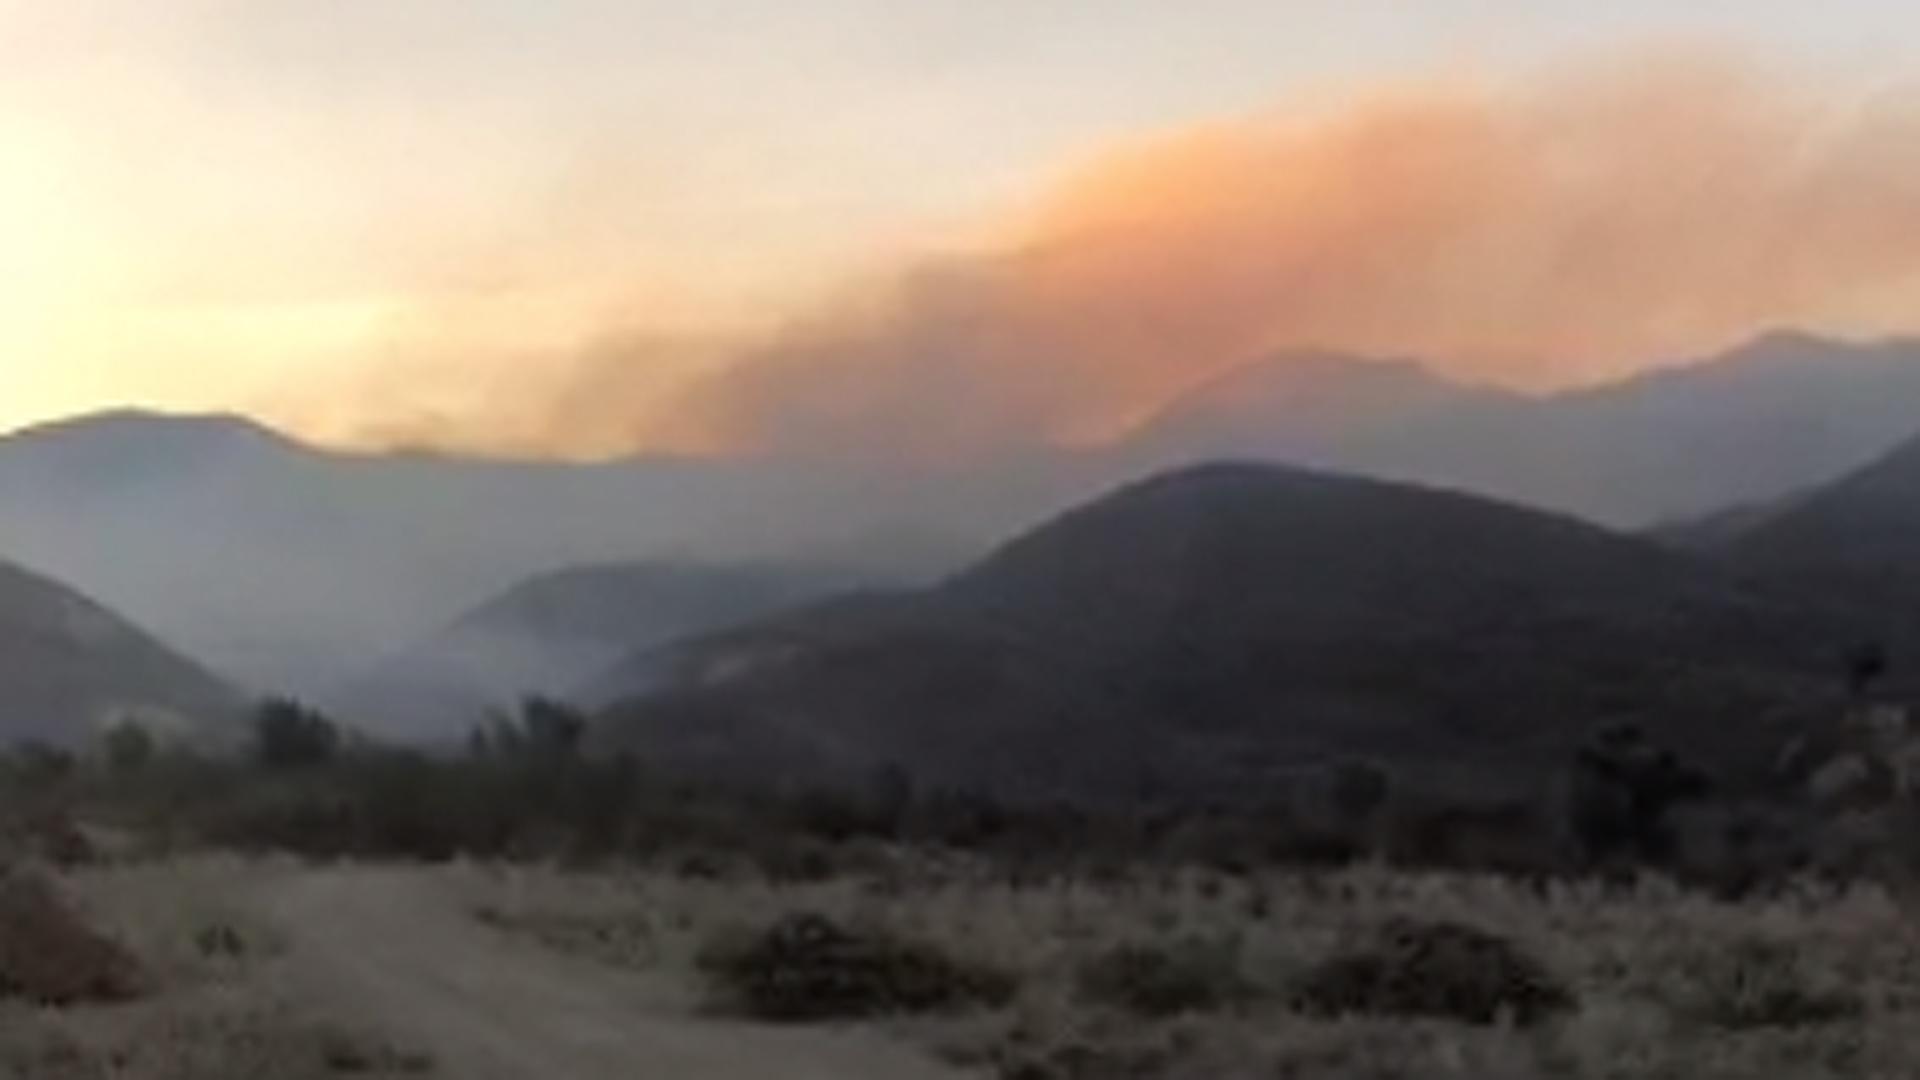 The Briggs Fire burns near Santa Paula on Nov. 15, 2018. (Credit: Ventura County Fire Department)